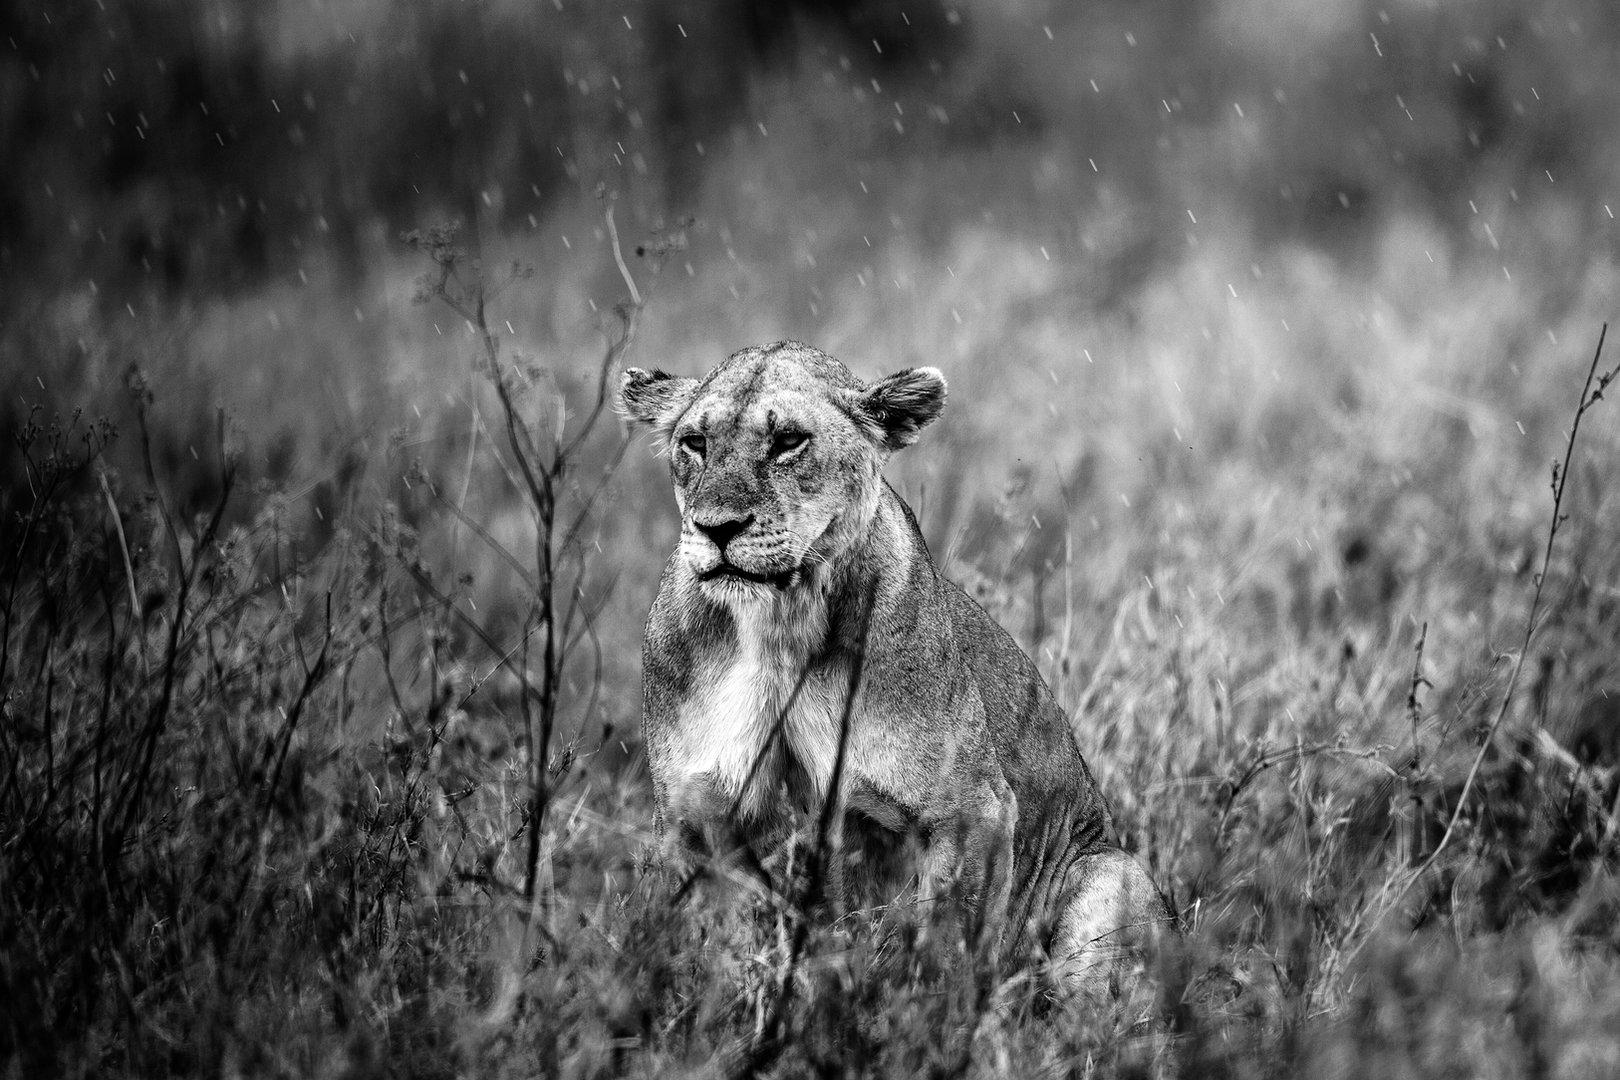 LIONESS UNDER THE RAIN